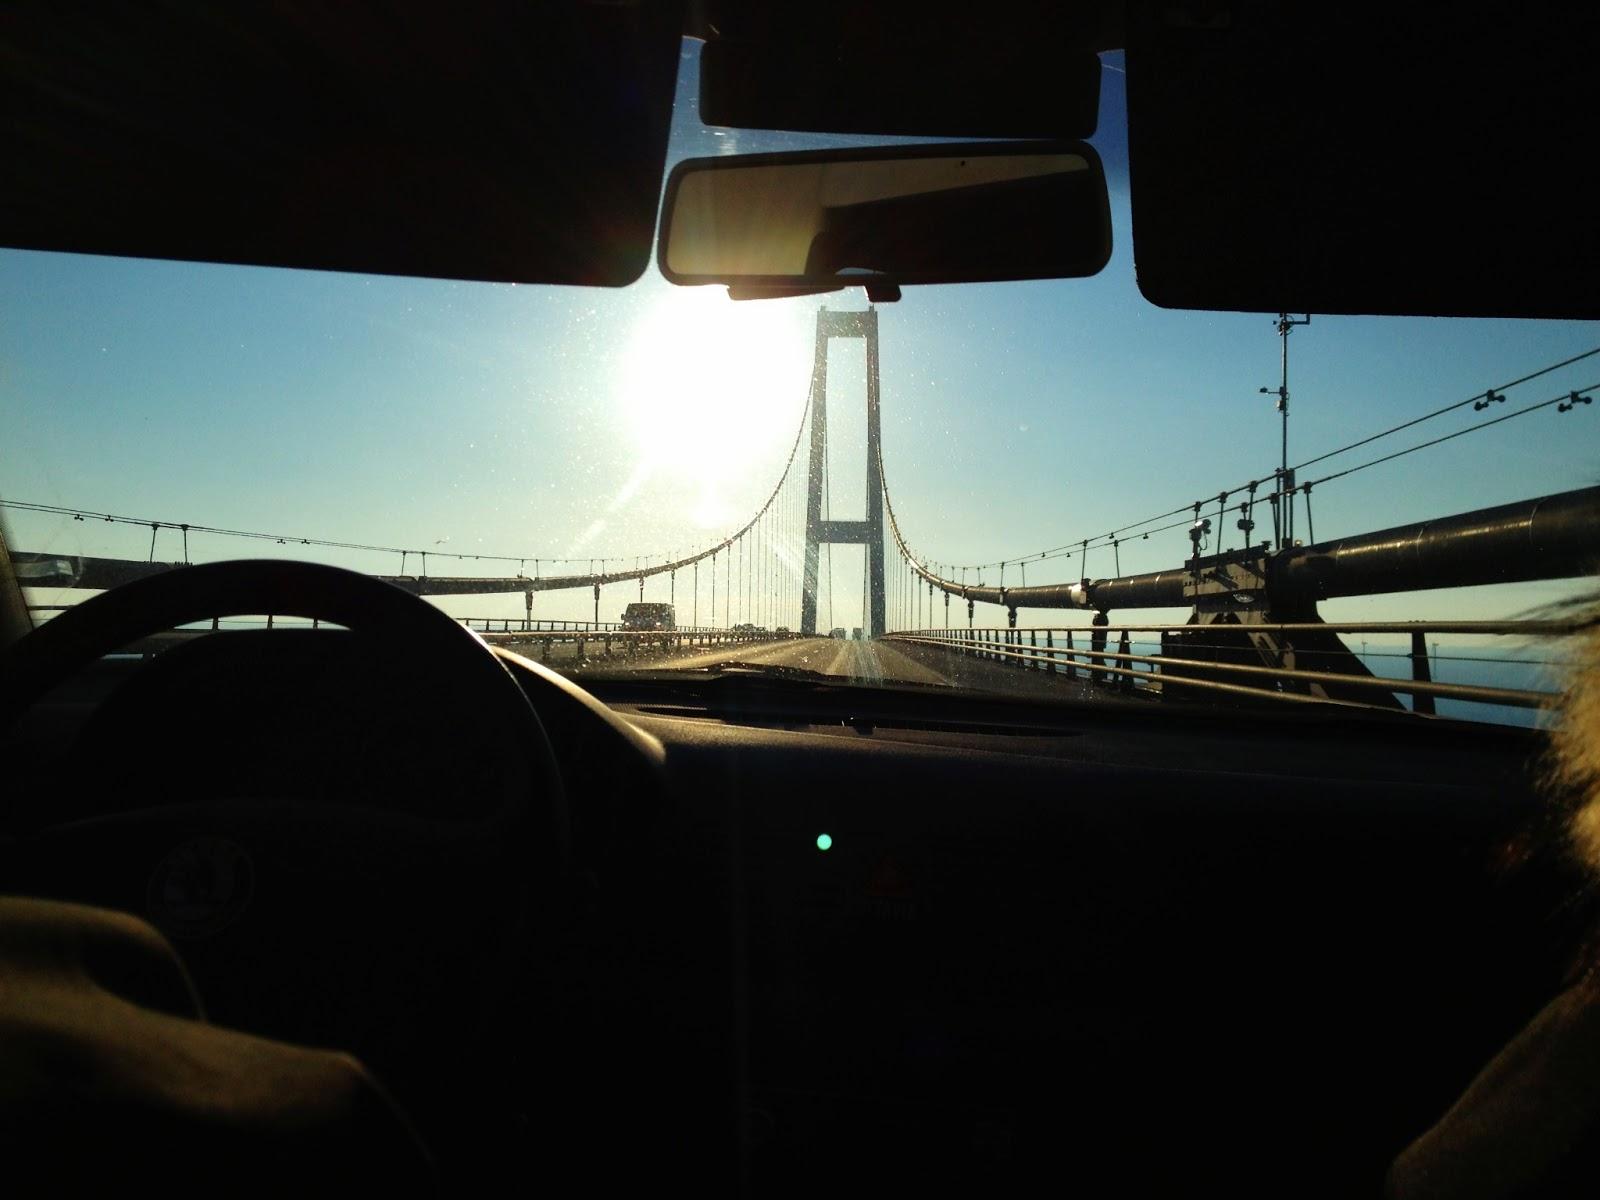 Storebælt, Storebæltsbroen, bil, udsigt, vand, bro, fyn, sjælland, jylland, danmark